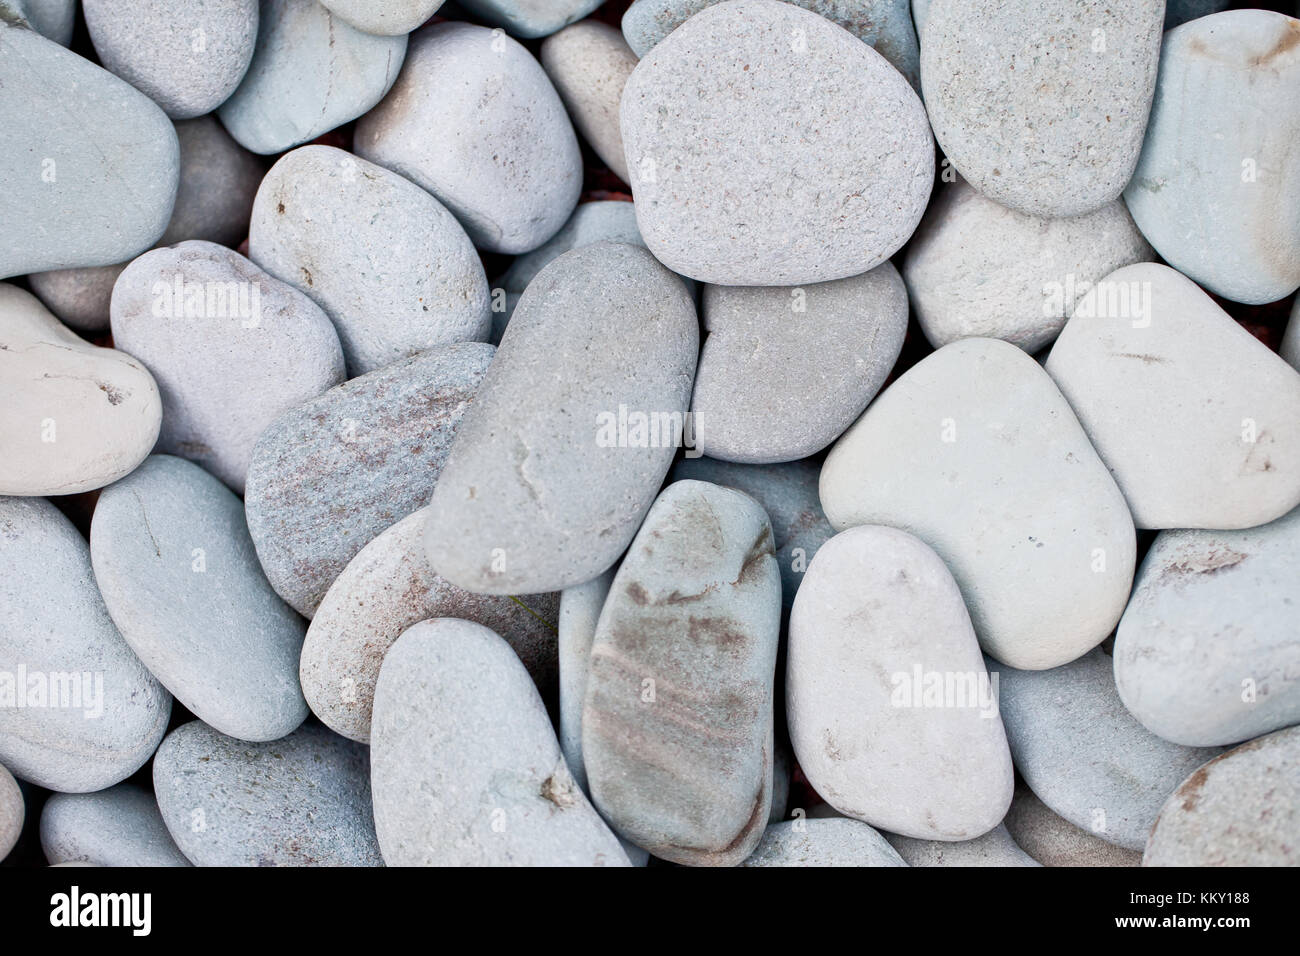 White and grey pebble stones - Stock Image